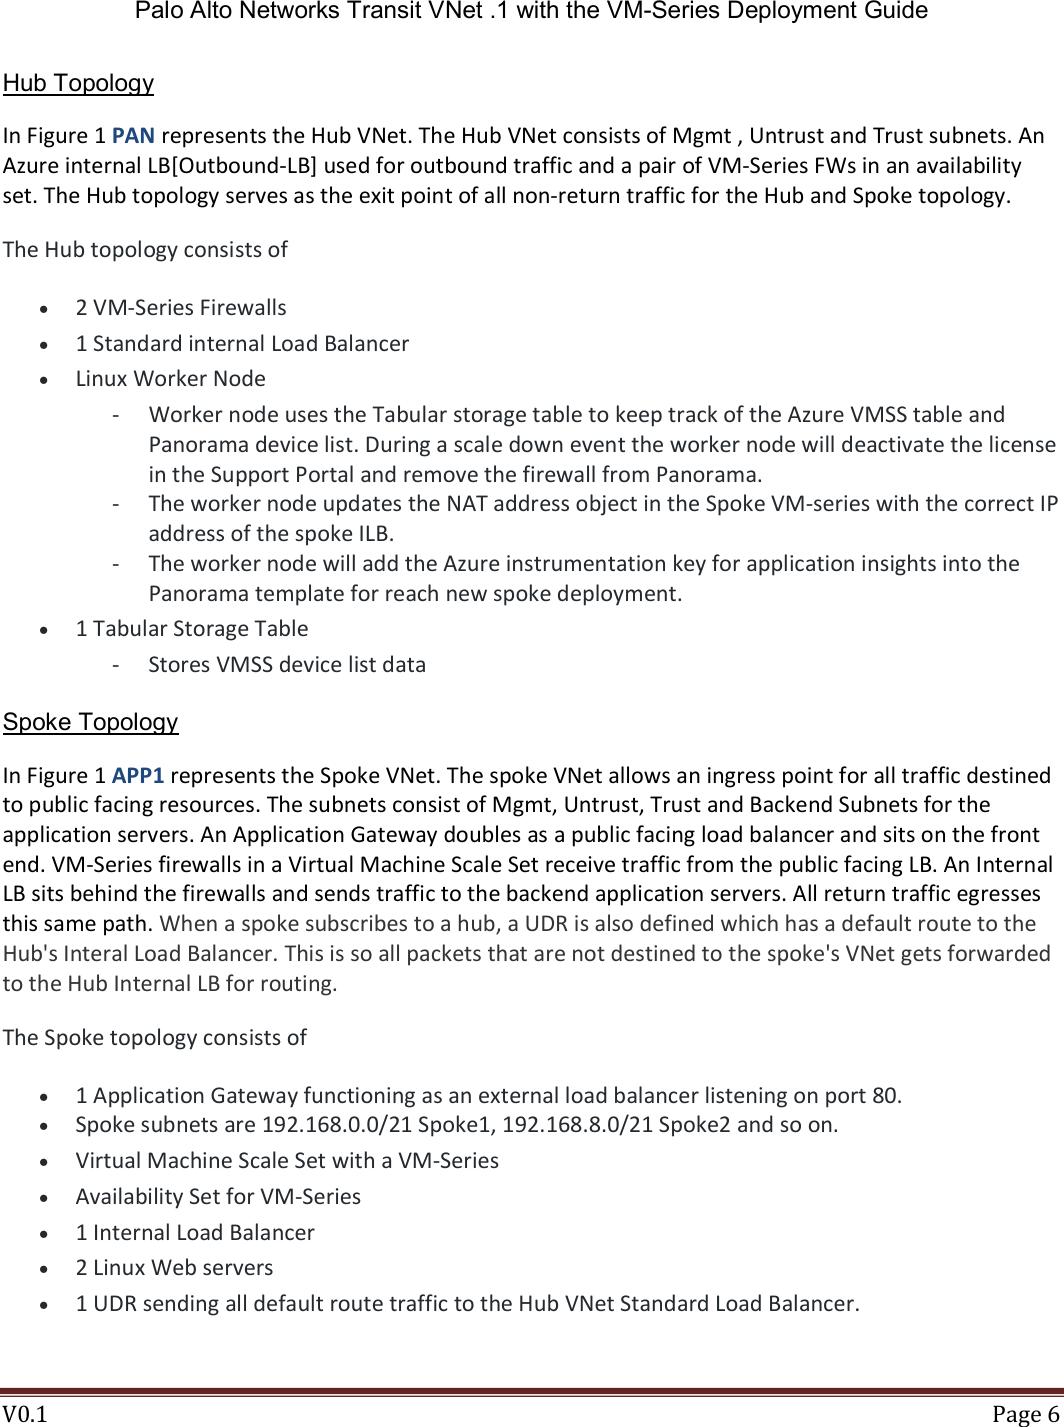 Azure_Transit_vNet 1_Deployment_GuideRev1 2x Azure Transit VNet0 1